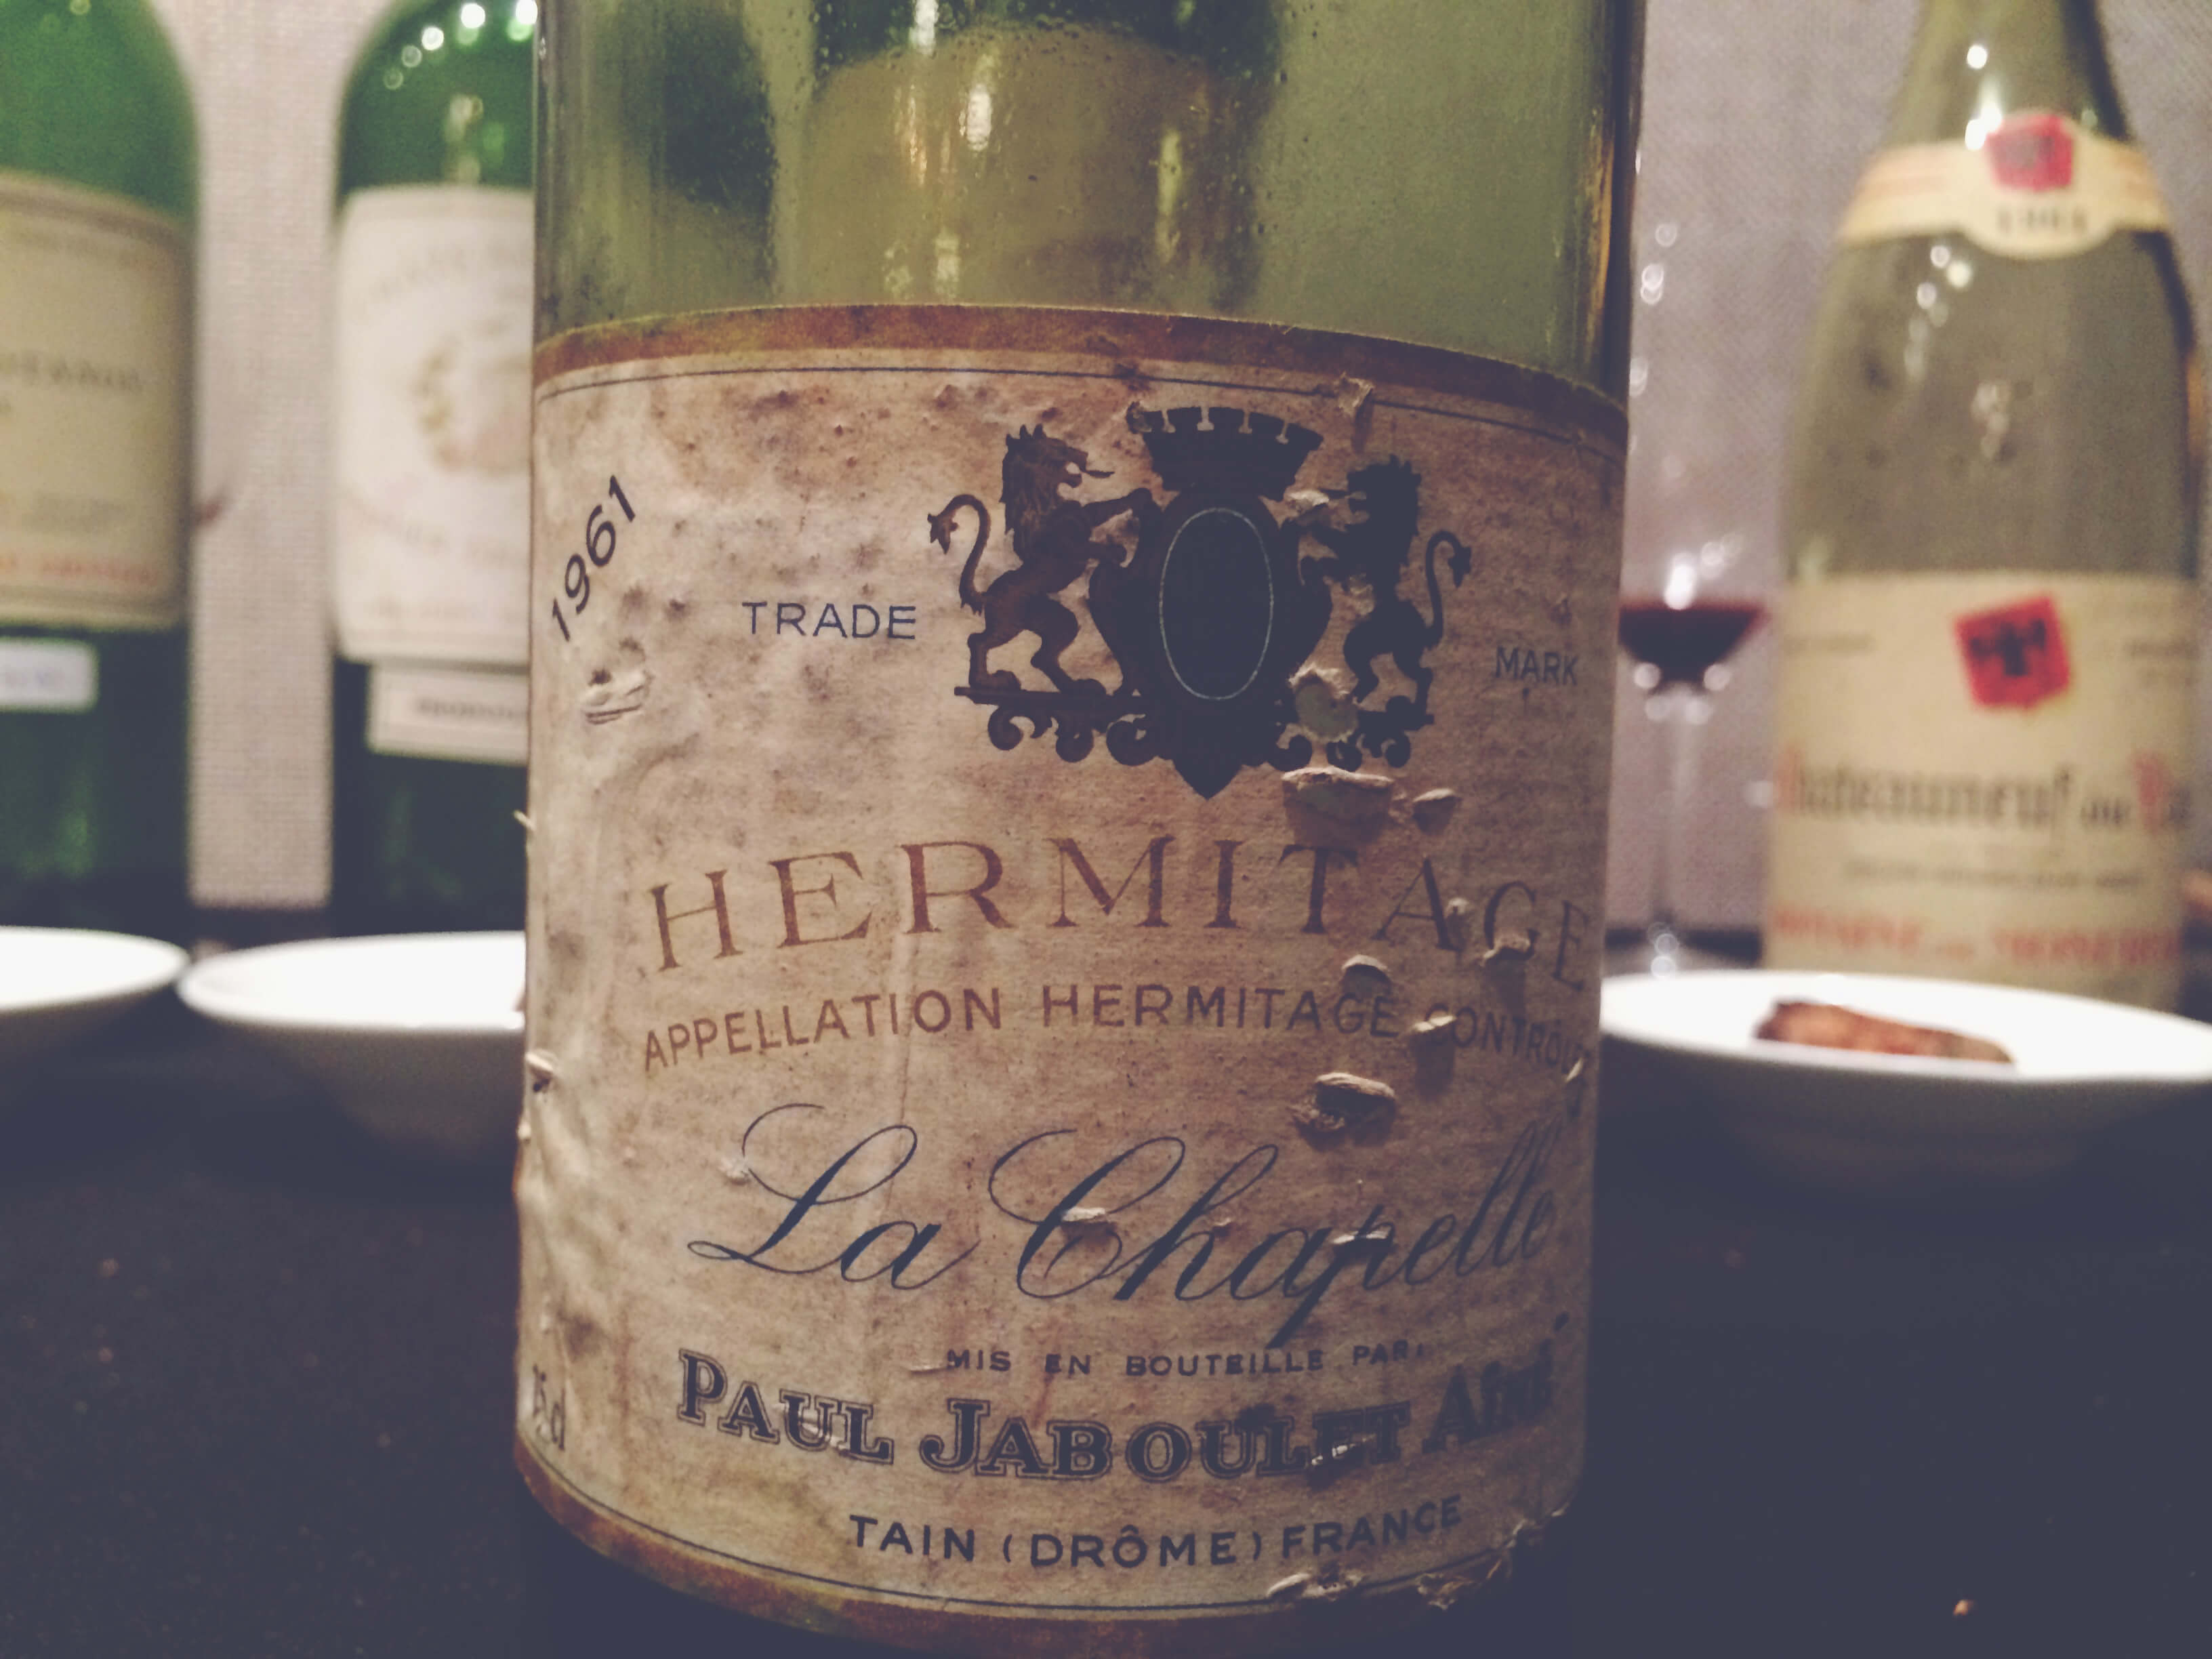 Jaboulet Hermitage La Chapelle 1961, Guy Desert Island Wines